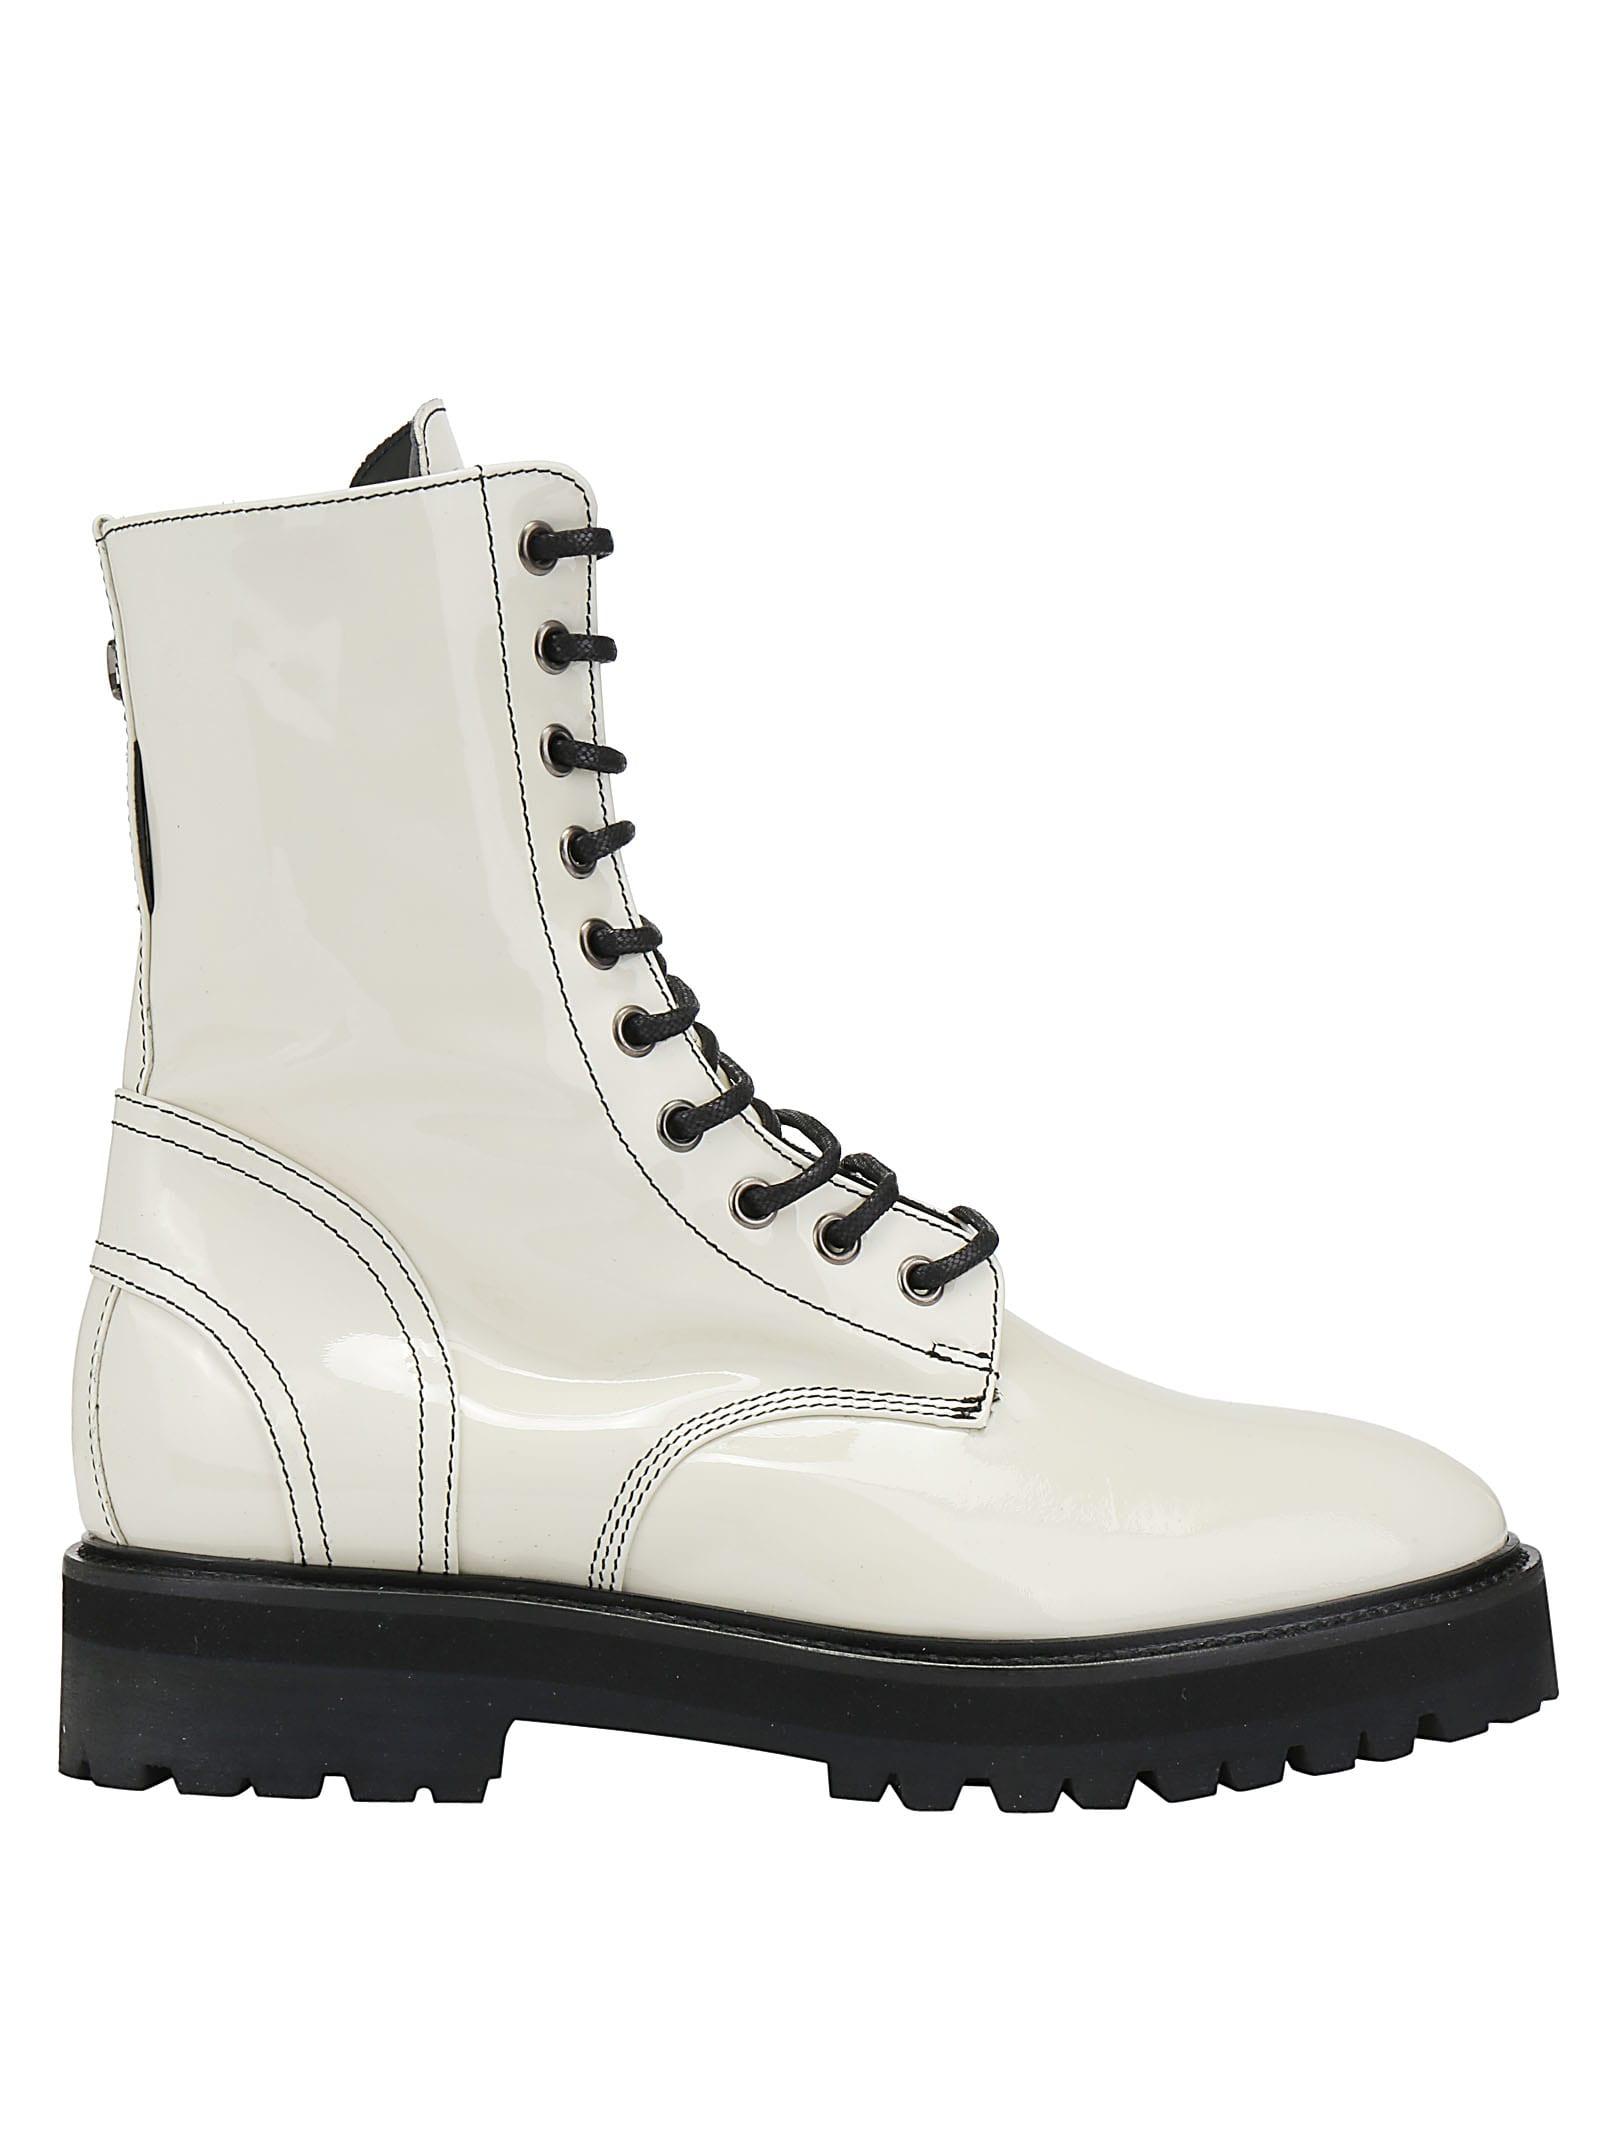 Dawni Boots